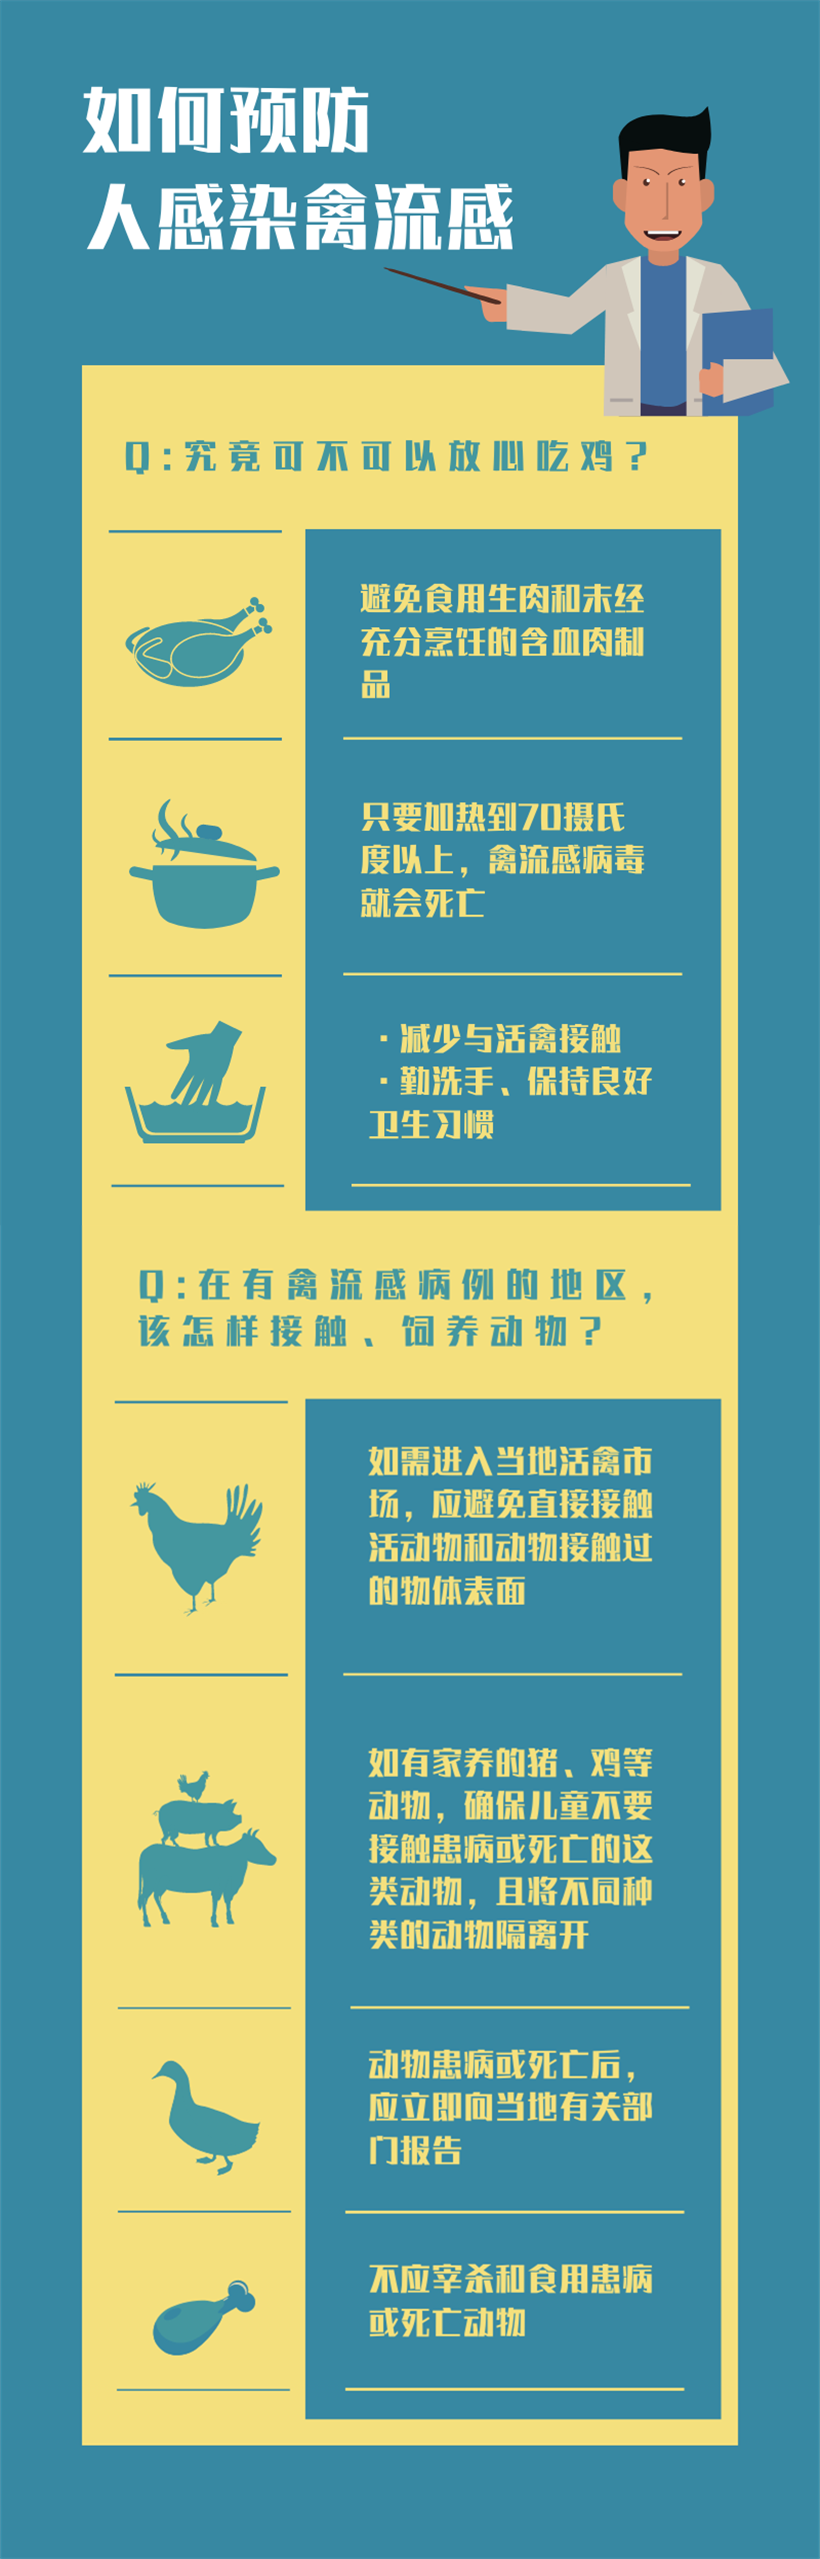 H5N8型禽流感传人 还能不能快乐吃鸡?